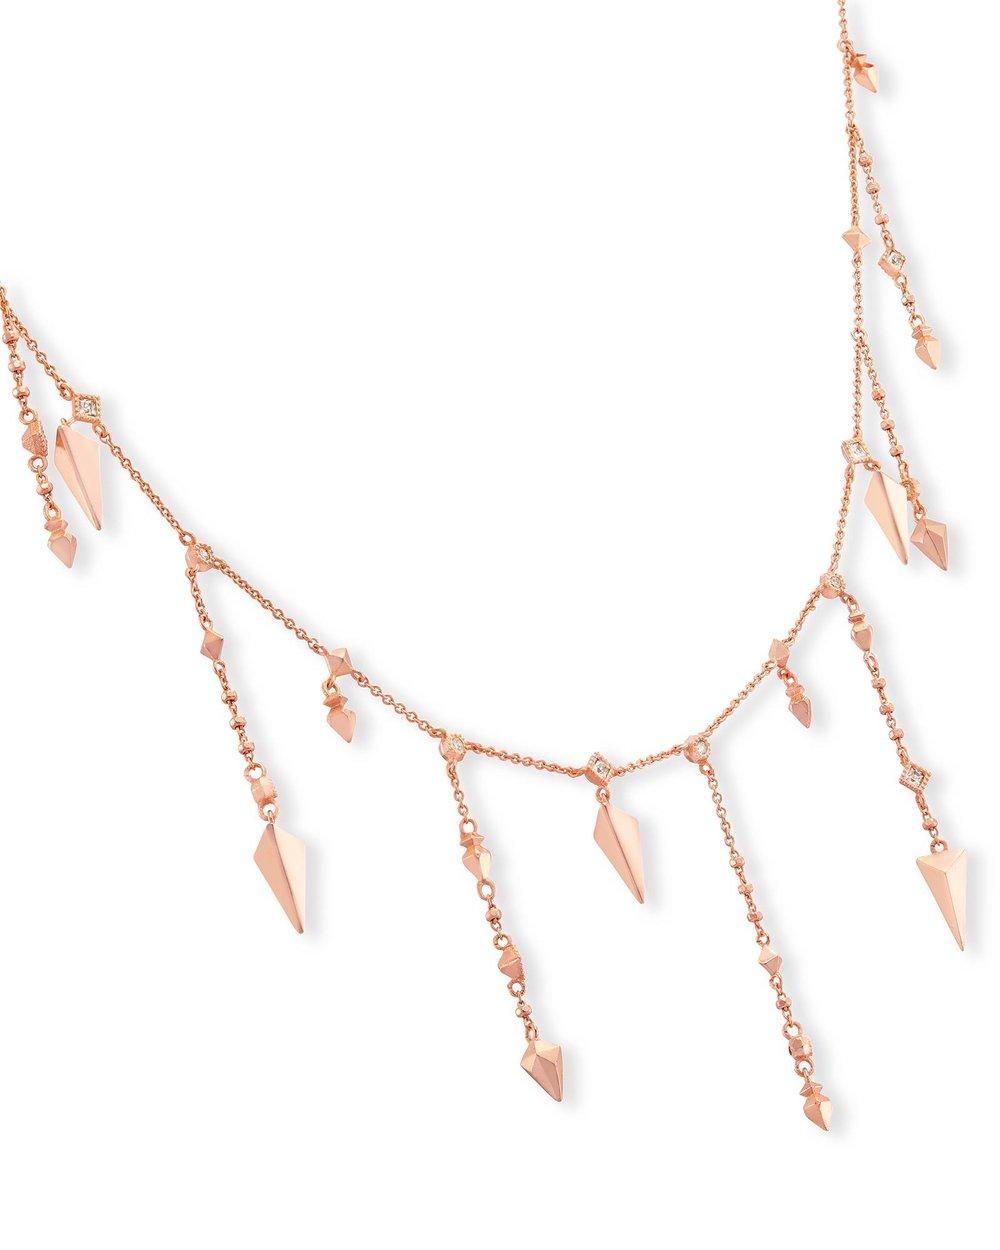 kendra-scott-loralei-long-necklace-in-rose-gold_01_default_lg.jpg